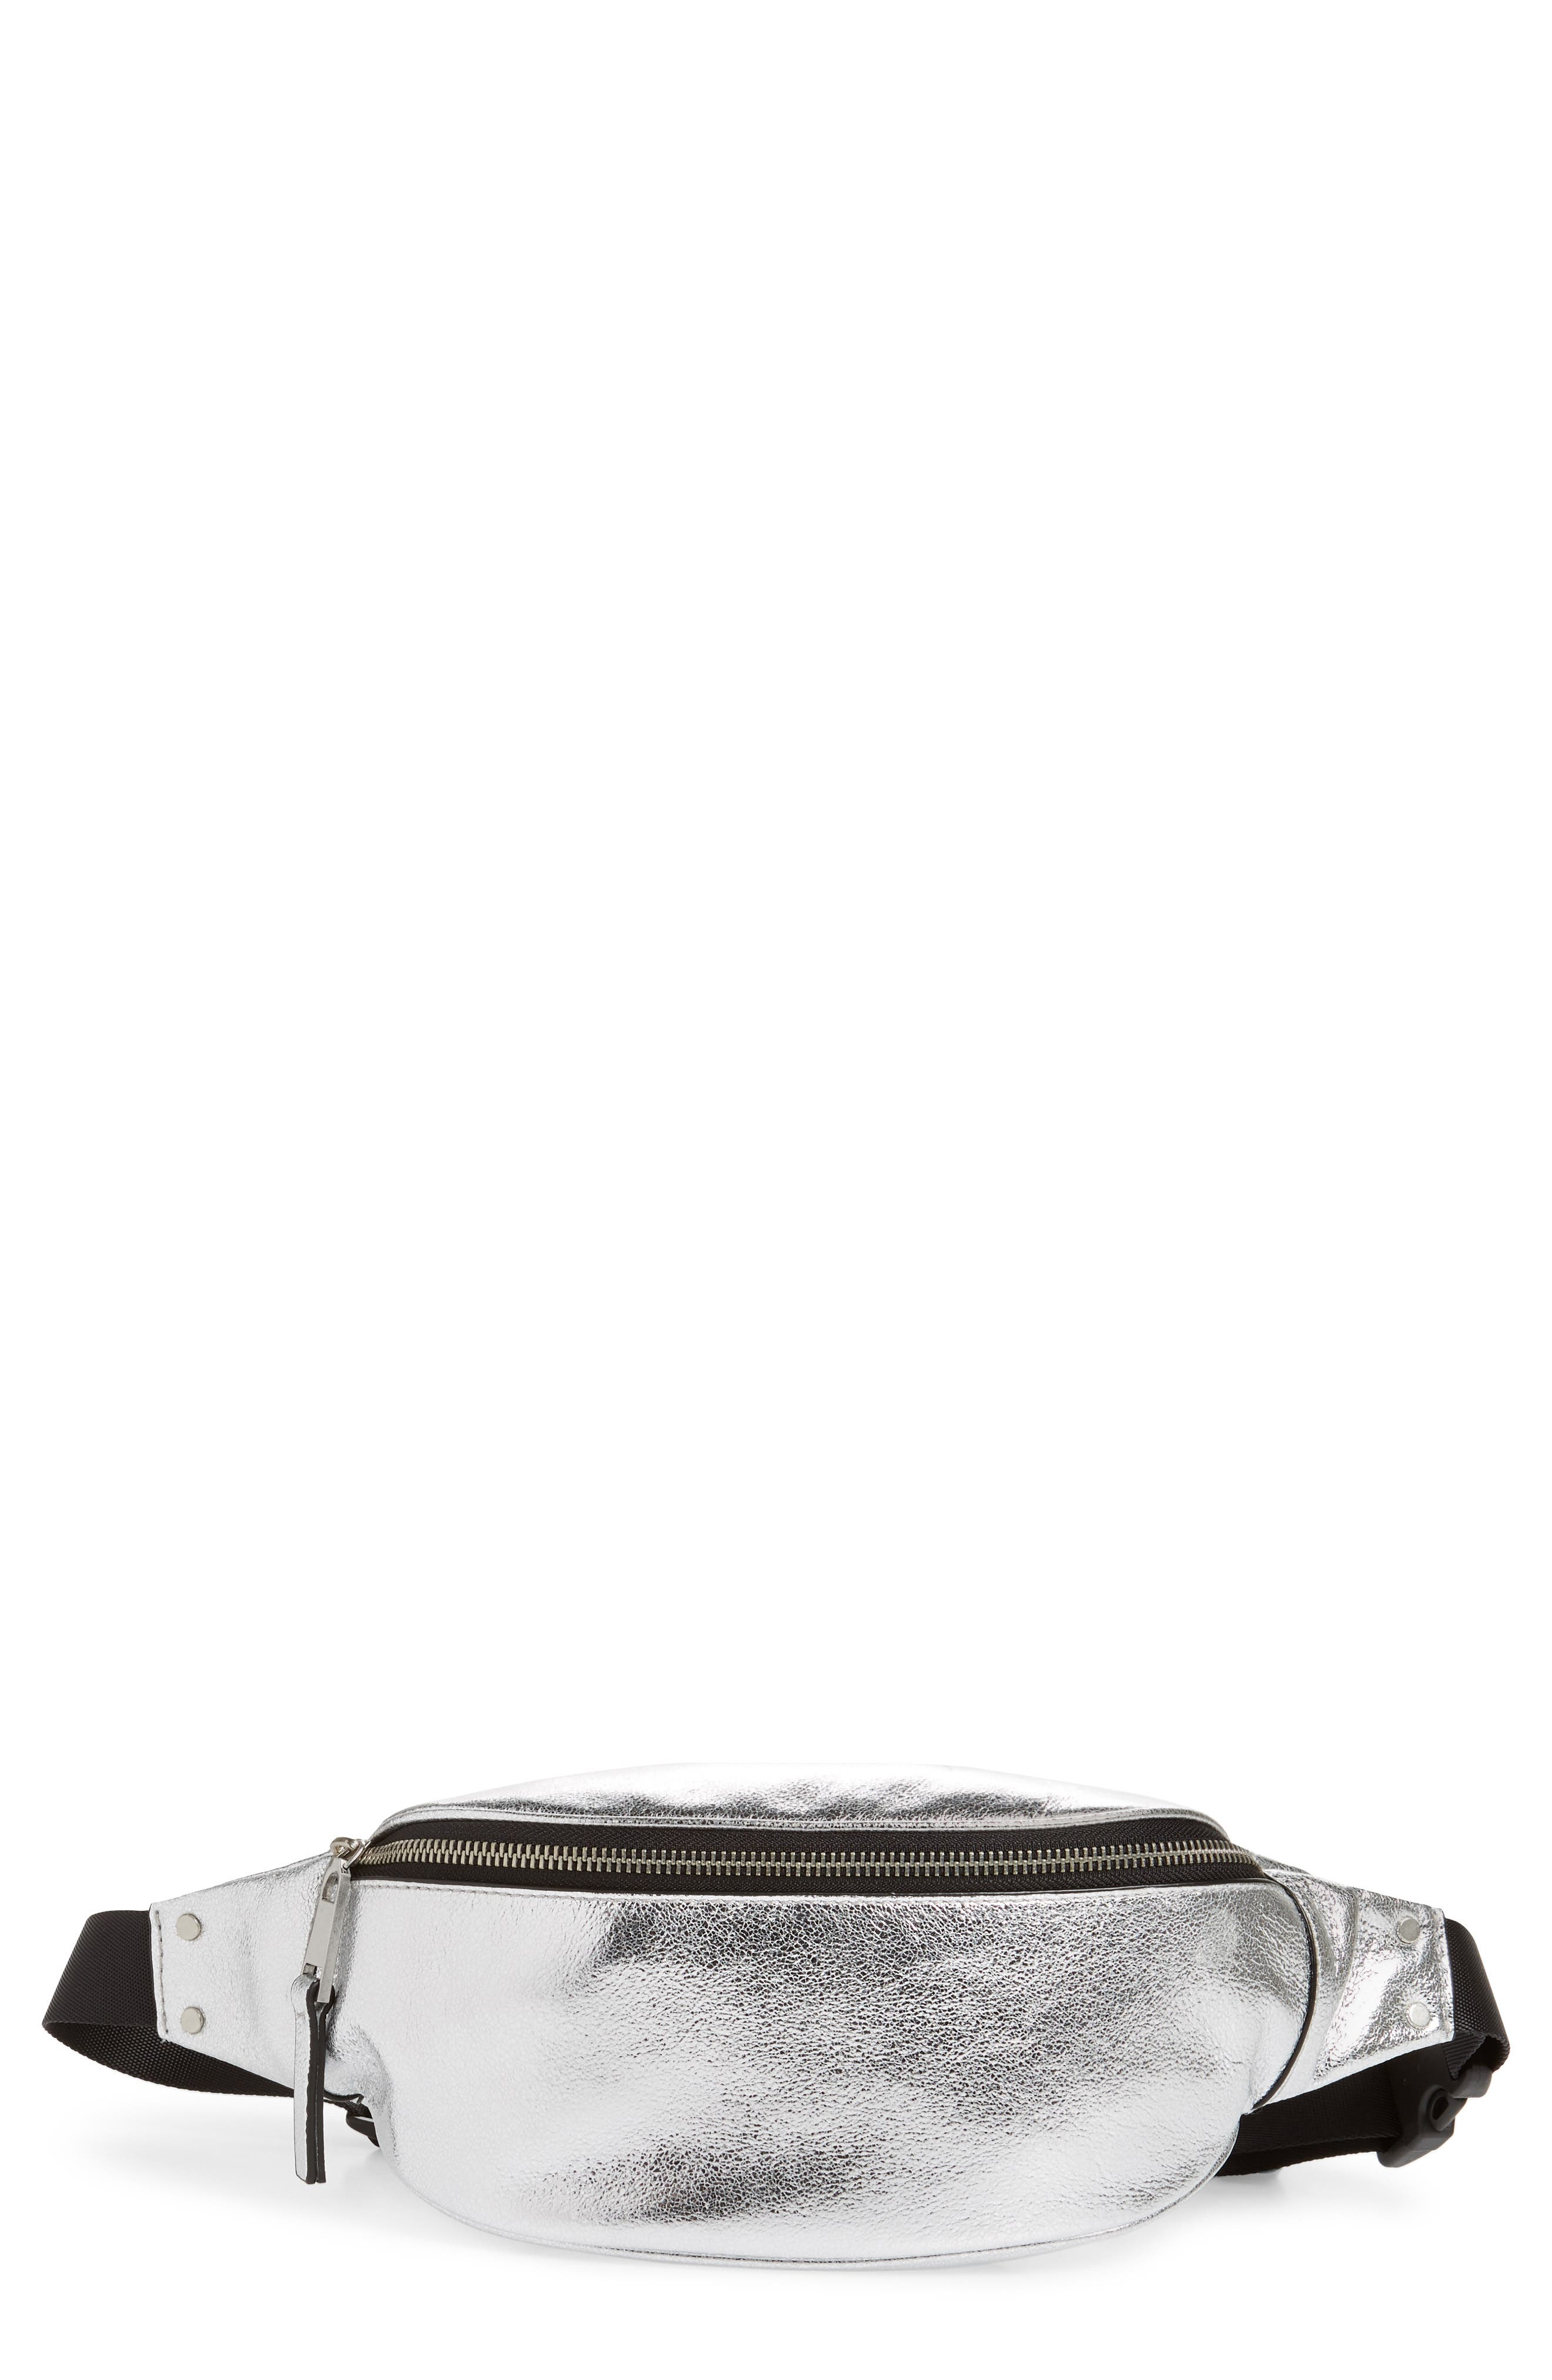 TREASURE & BOND Mason Metallic Leather Belt Bag, Main, color, SILVER